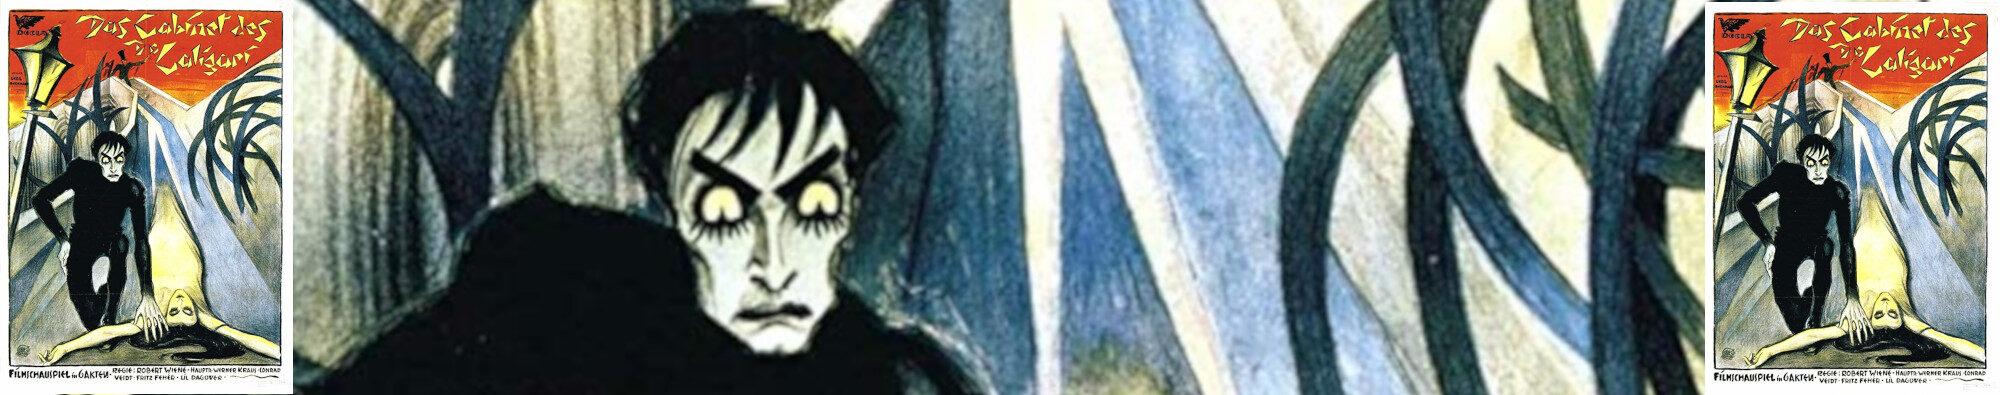 Das Cabinet des Dr. Caligari Banner